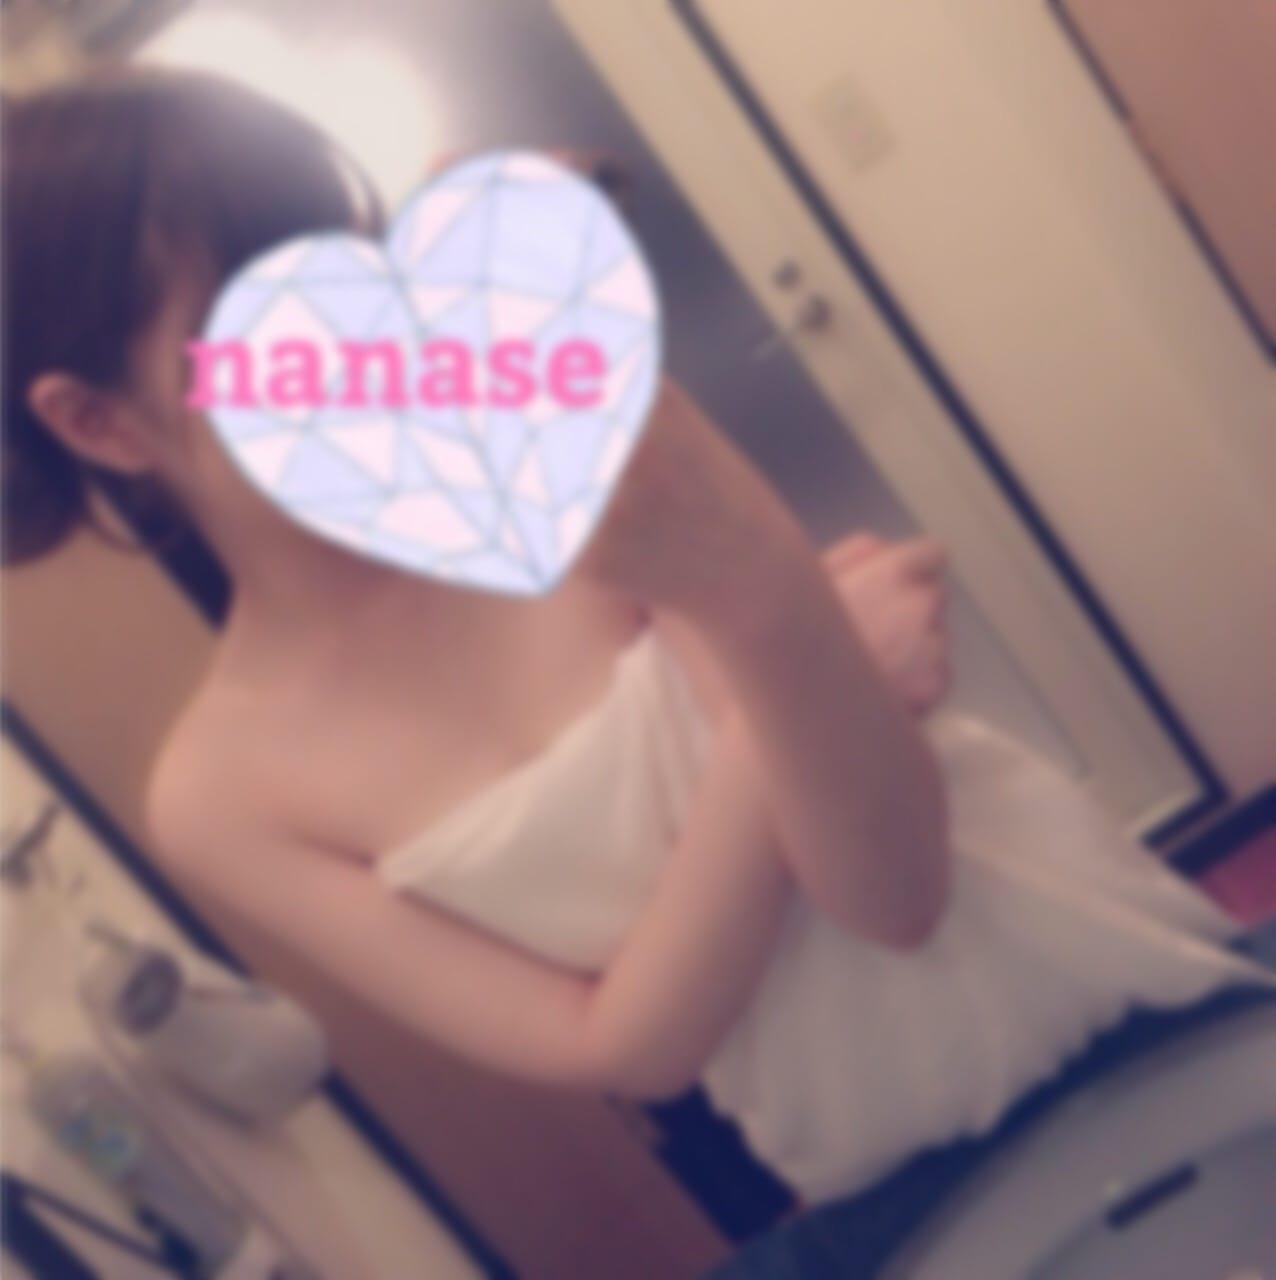 「WINDY402お客様♡」11/24(金) 18:21 | ナナセの写メ・風俗動画